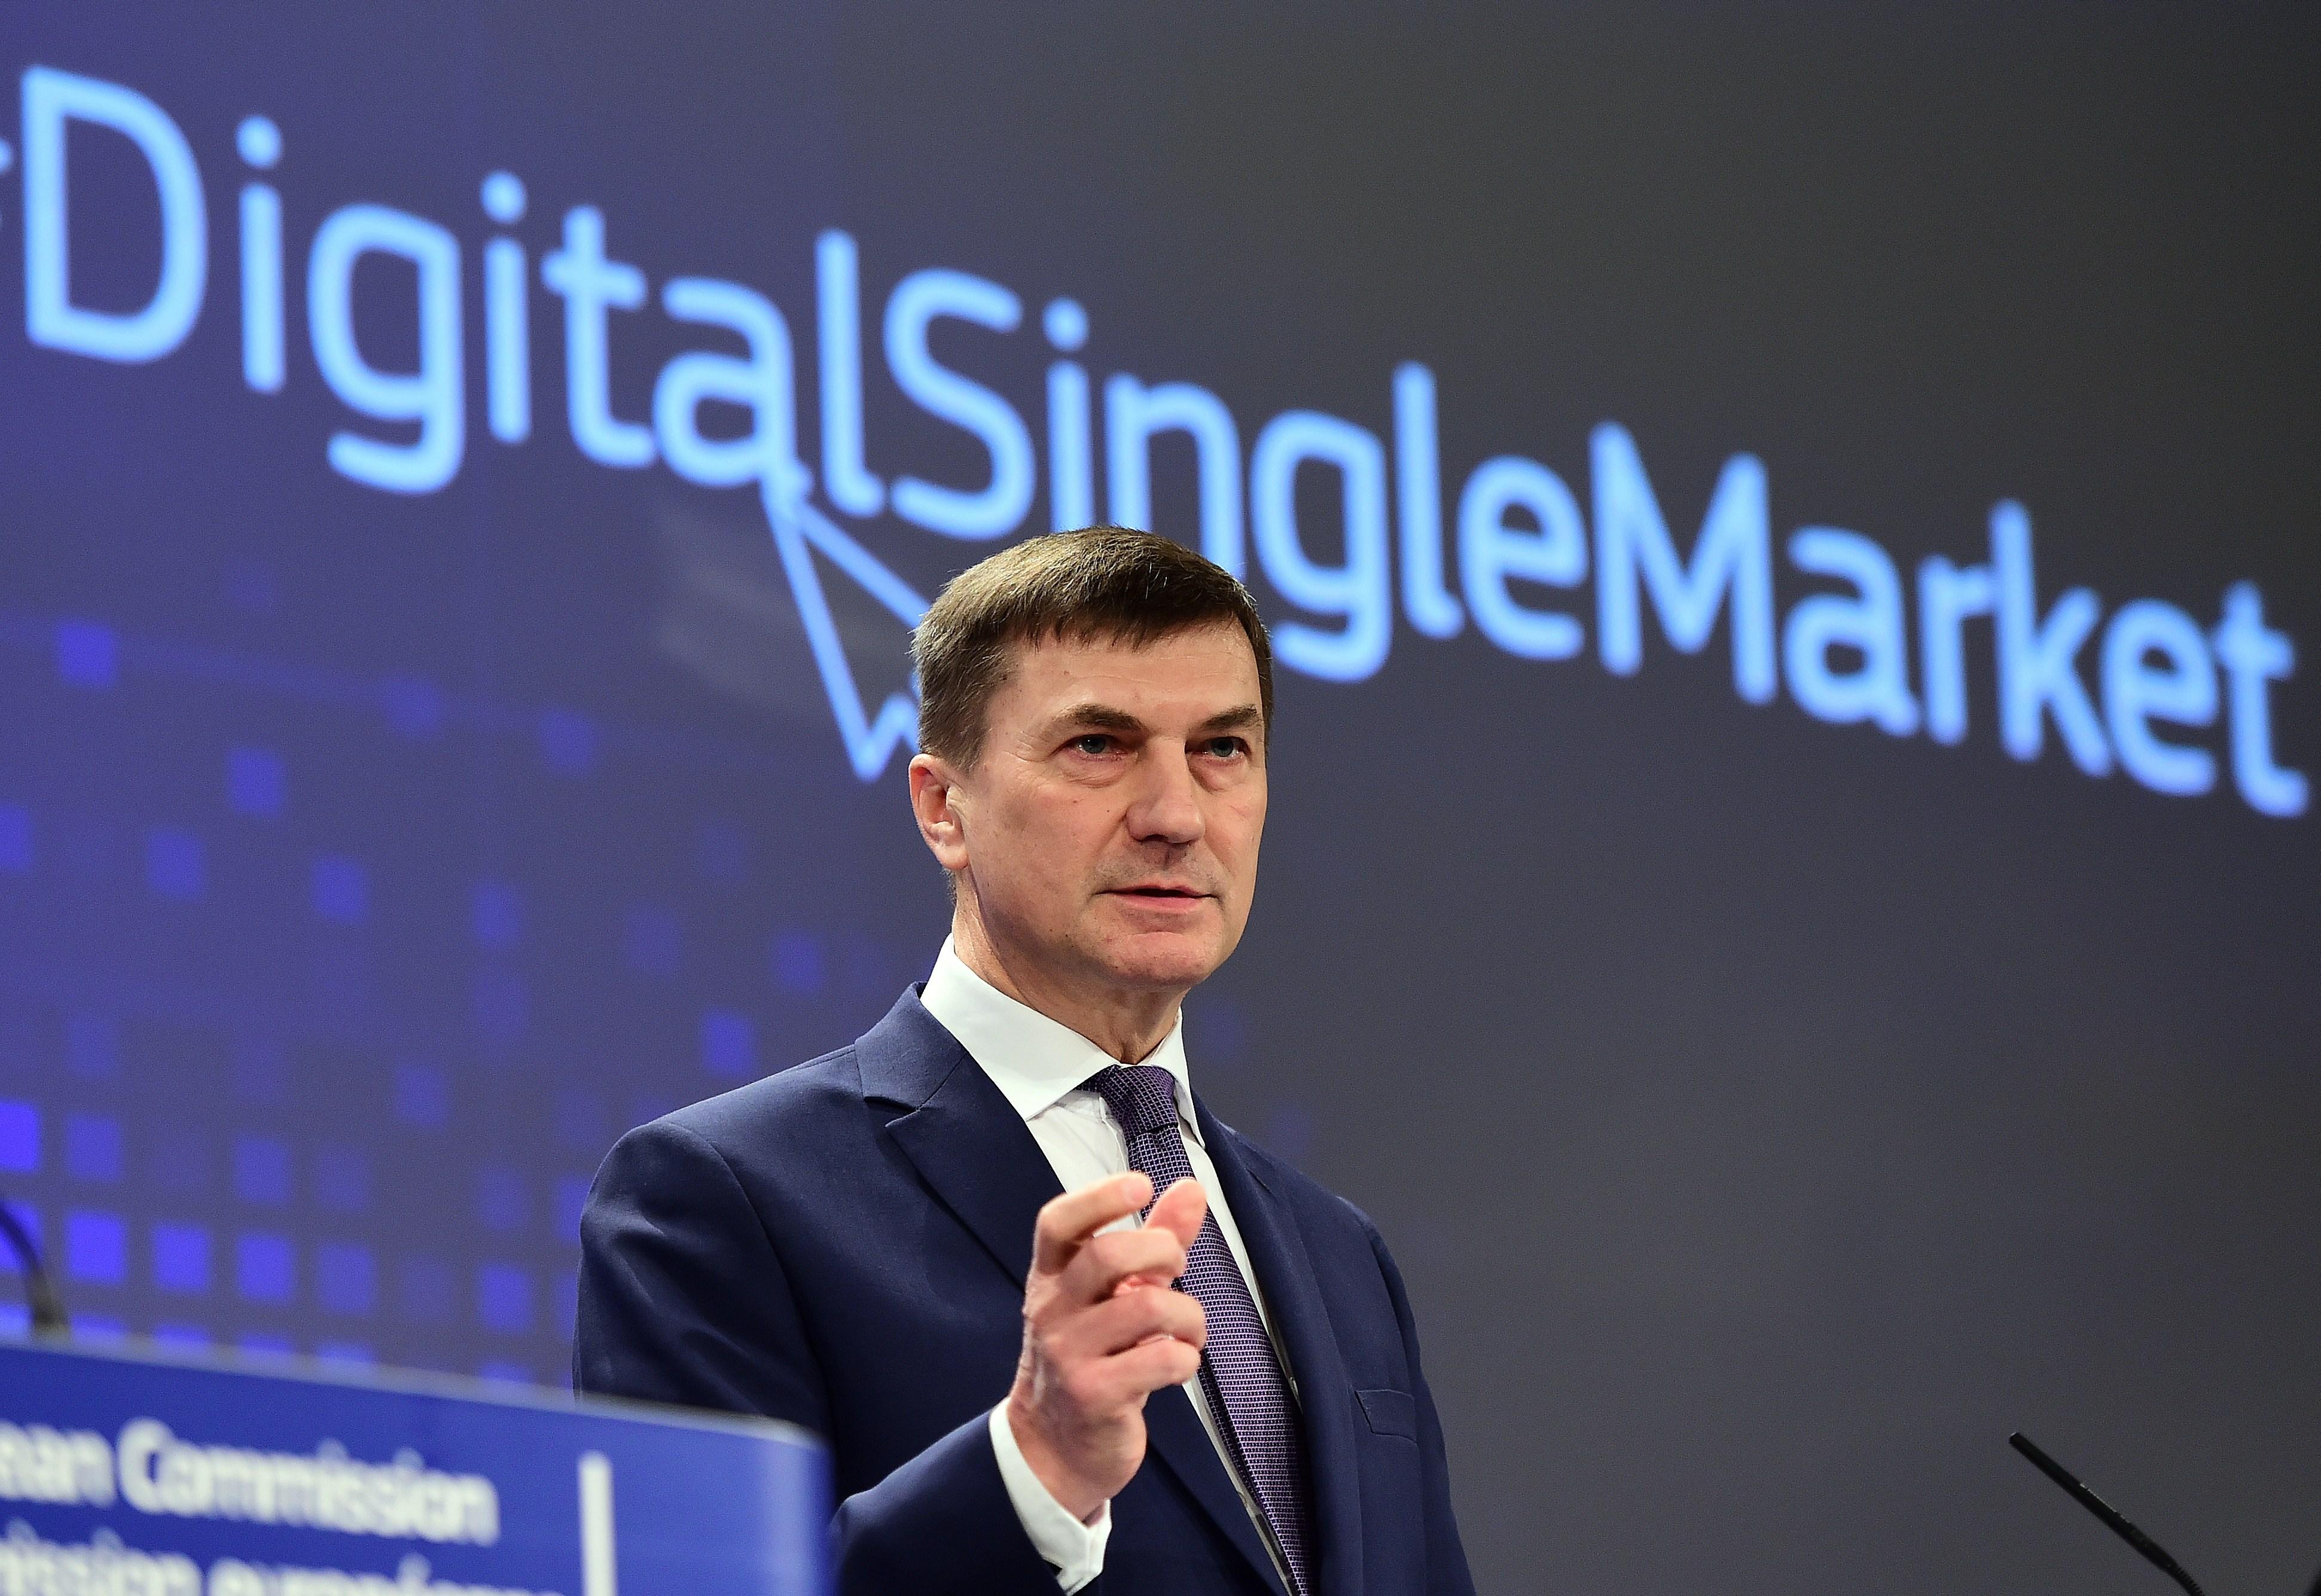 負責數碼事務的歐盟委員會副主席安德魯斯·安西普(Andrus Ansip)。(EMMANUEL DUNAND/AFP/Getty Images)